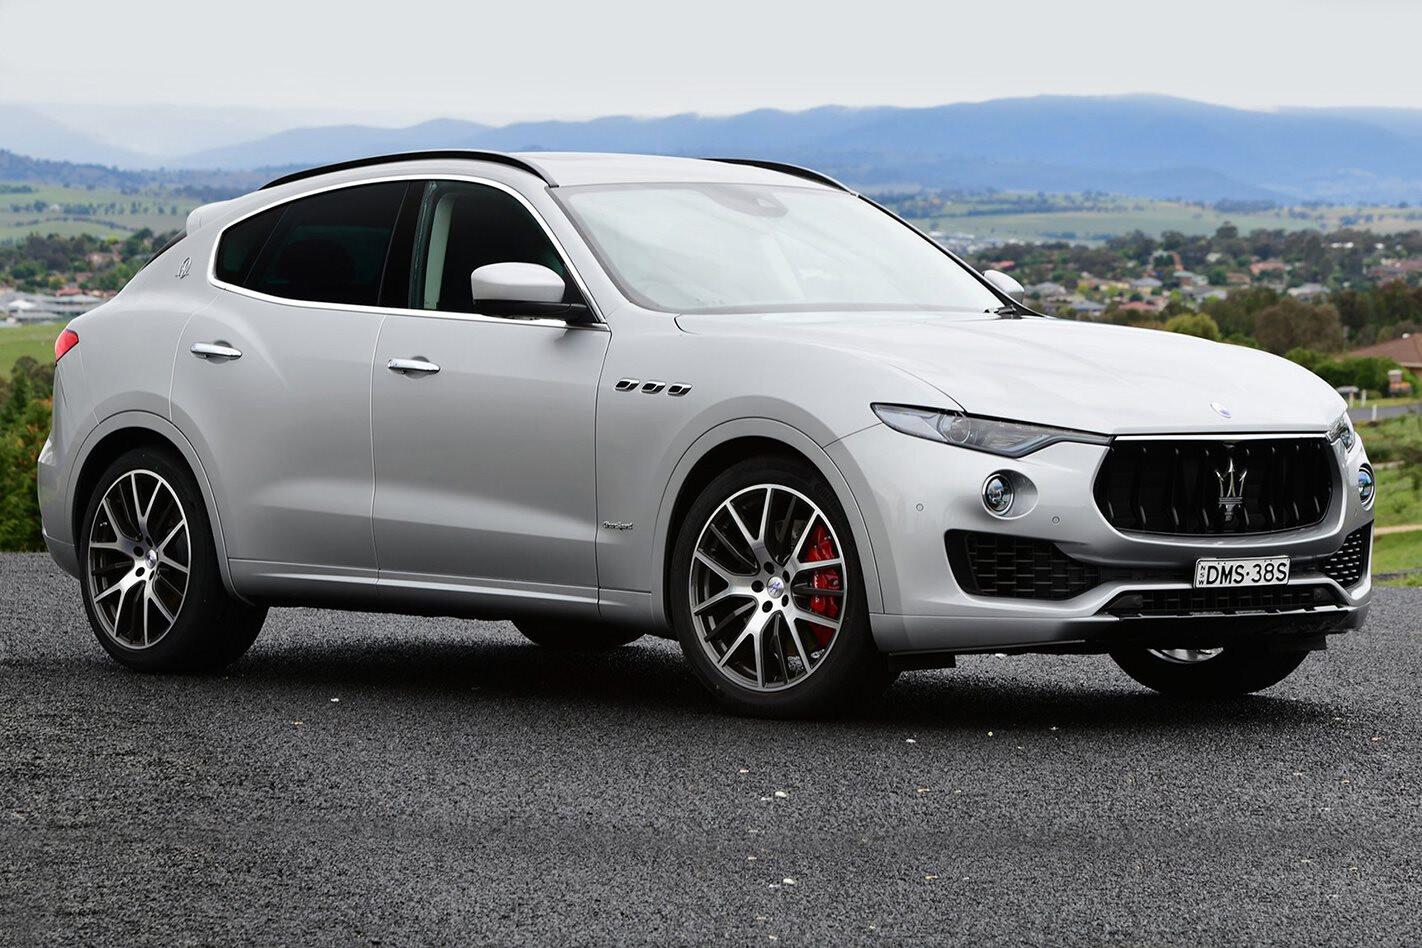 2018 Maserati Levante gains 321kW twin-turbo petrol engine